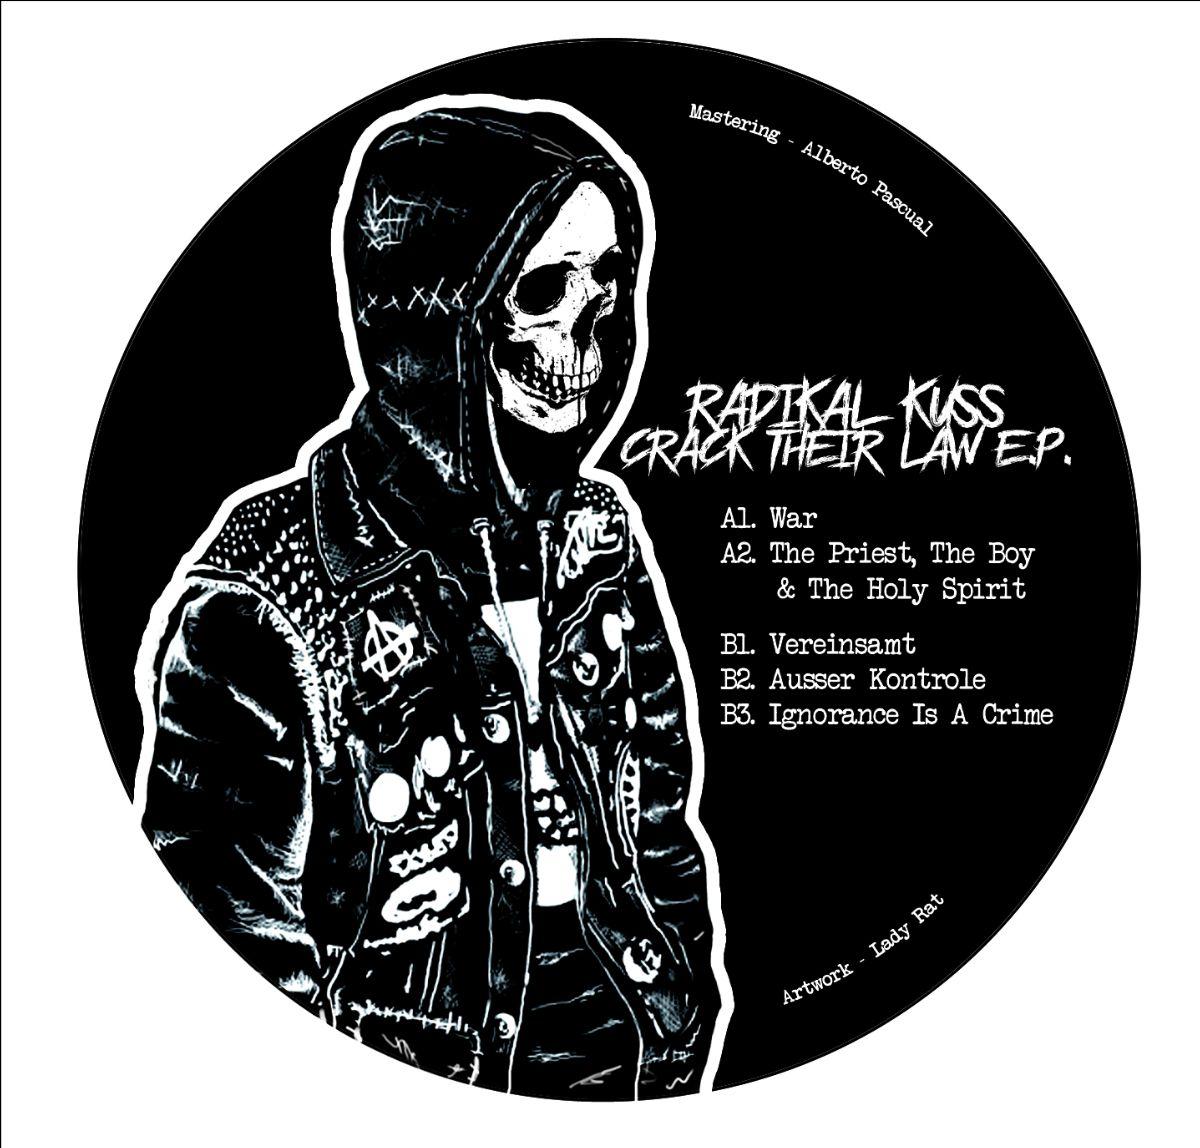 Radikal Kuss - Crack Their Law